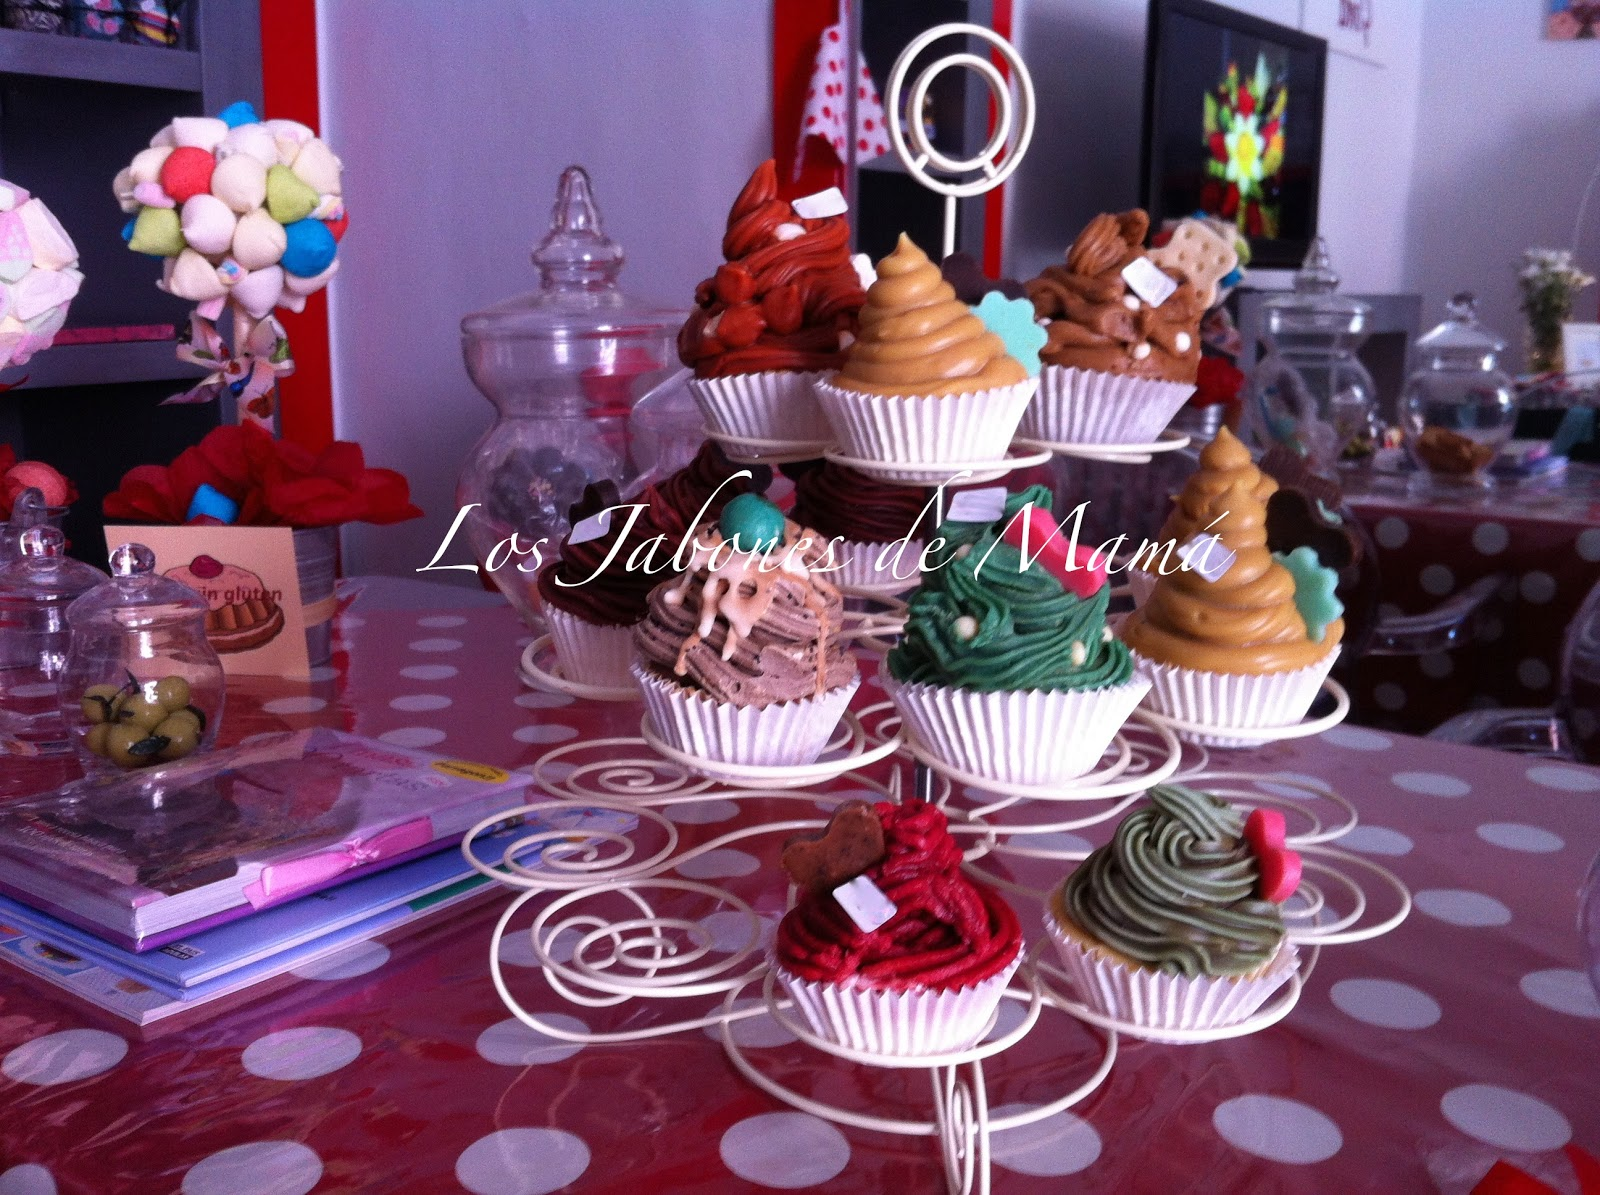 Los jabones de mam jabones para tienda gona - Cupcakes tenerife ...